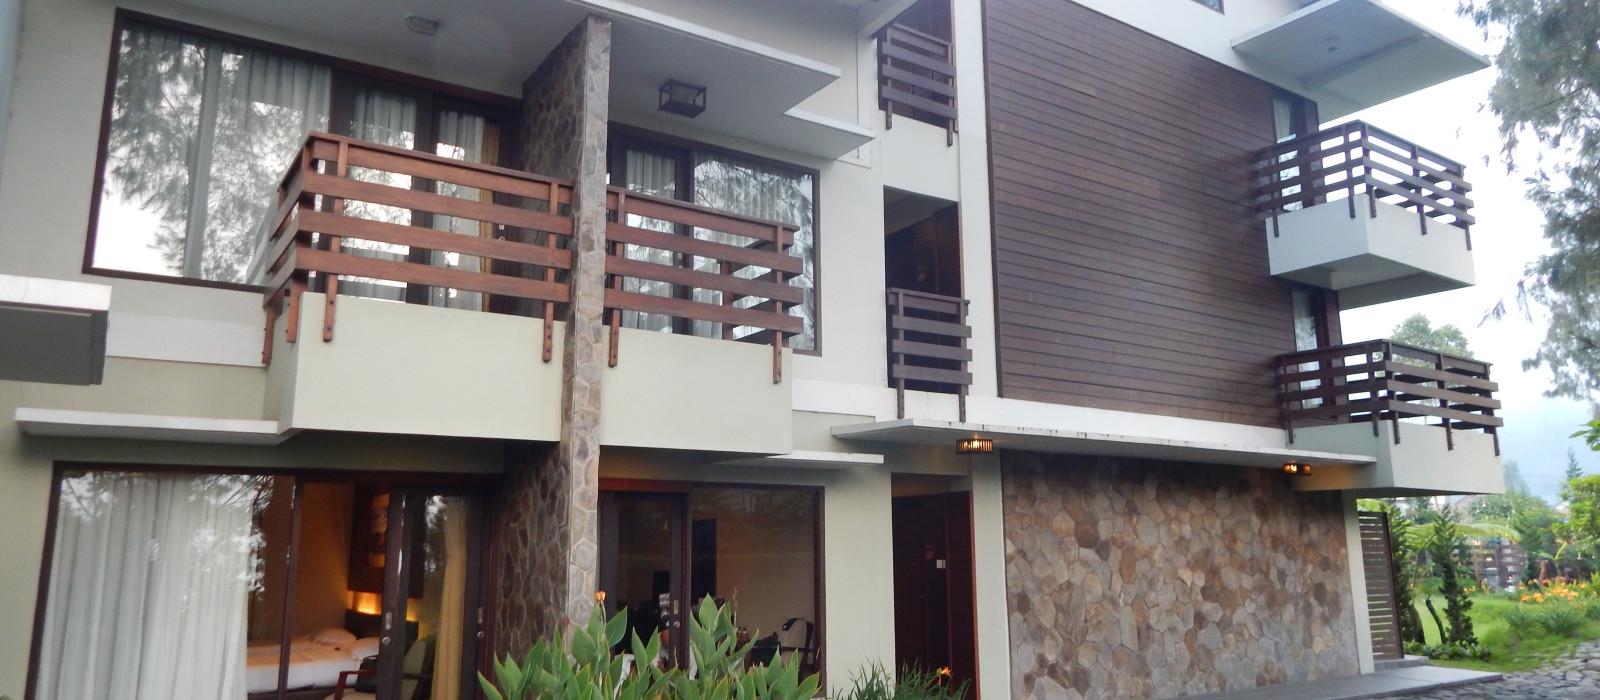 Hotel Jiwa Jawa Mount Bromo Indonesia